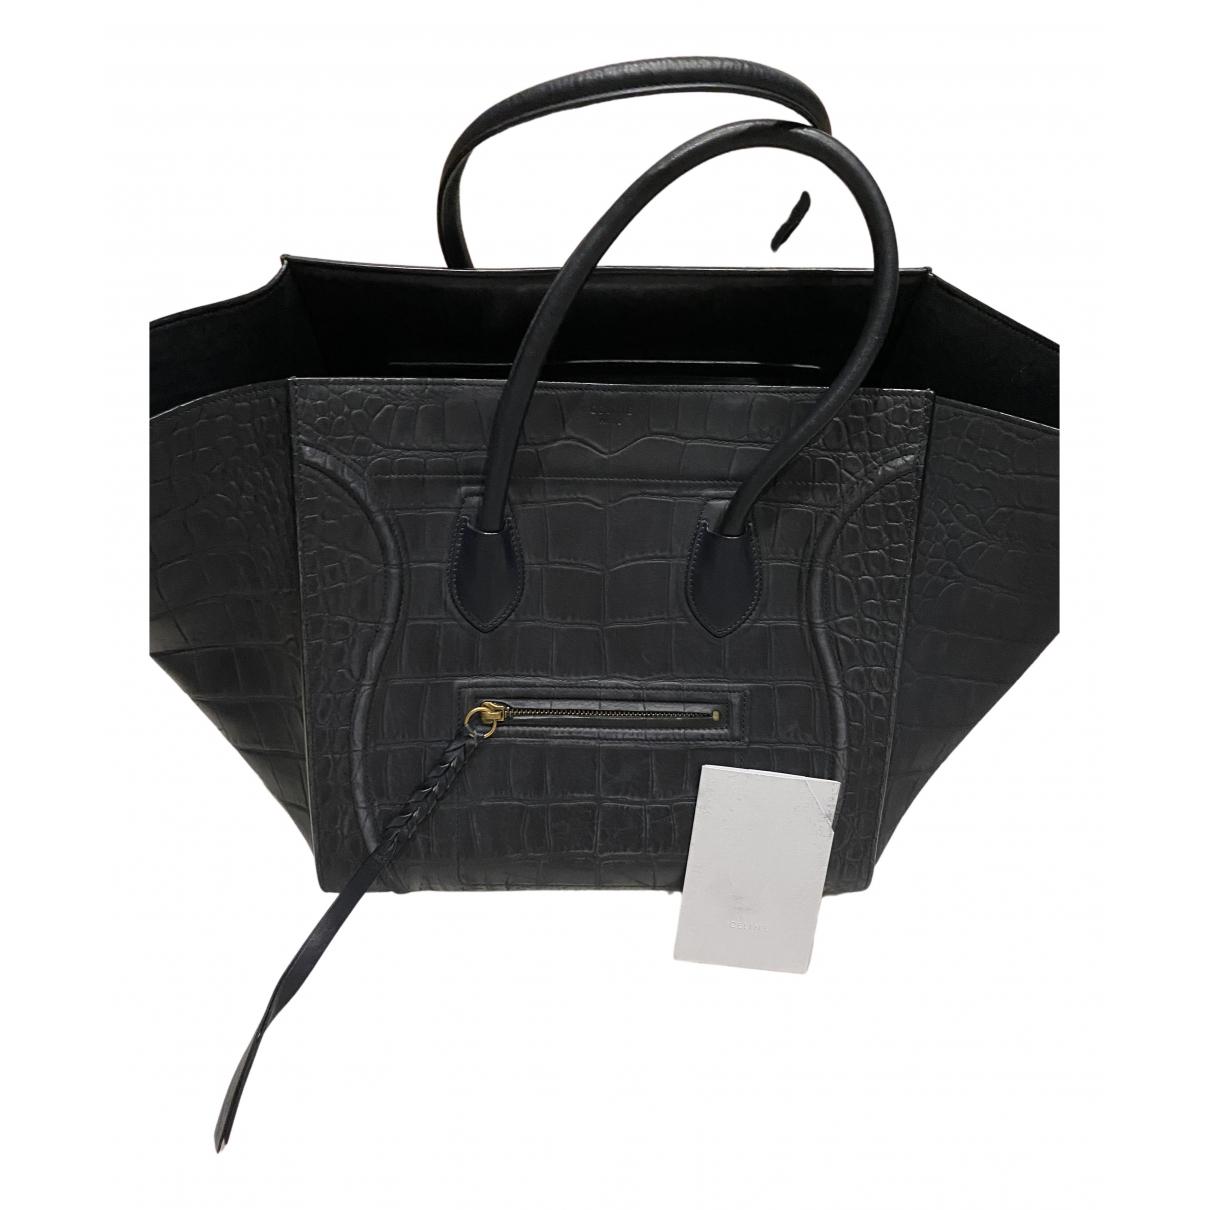 Celine Luggage Phantom Handtasche in  Marine Leder